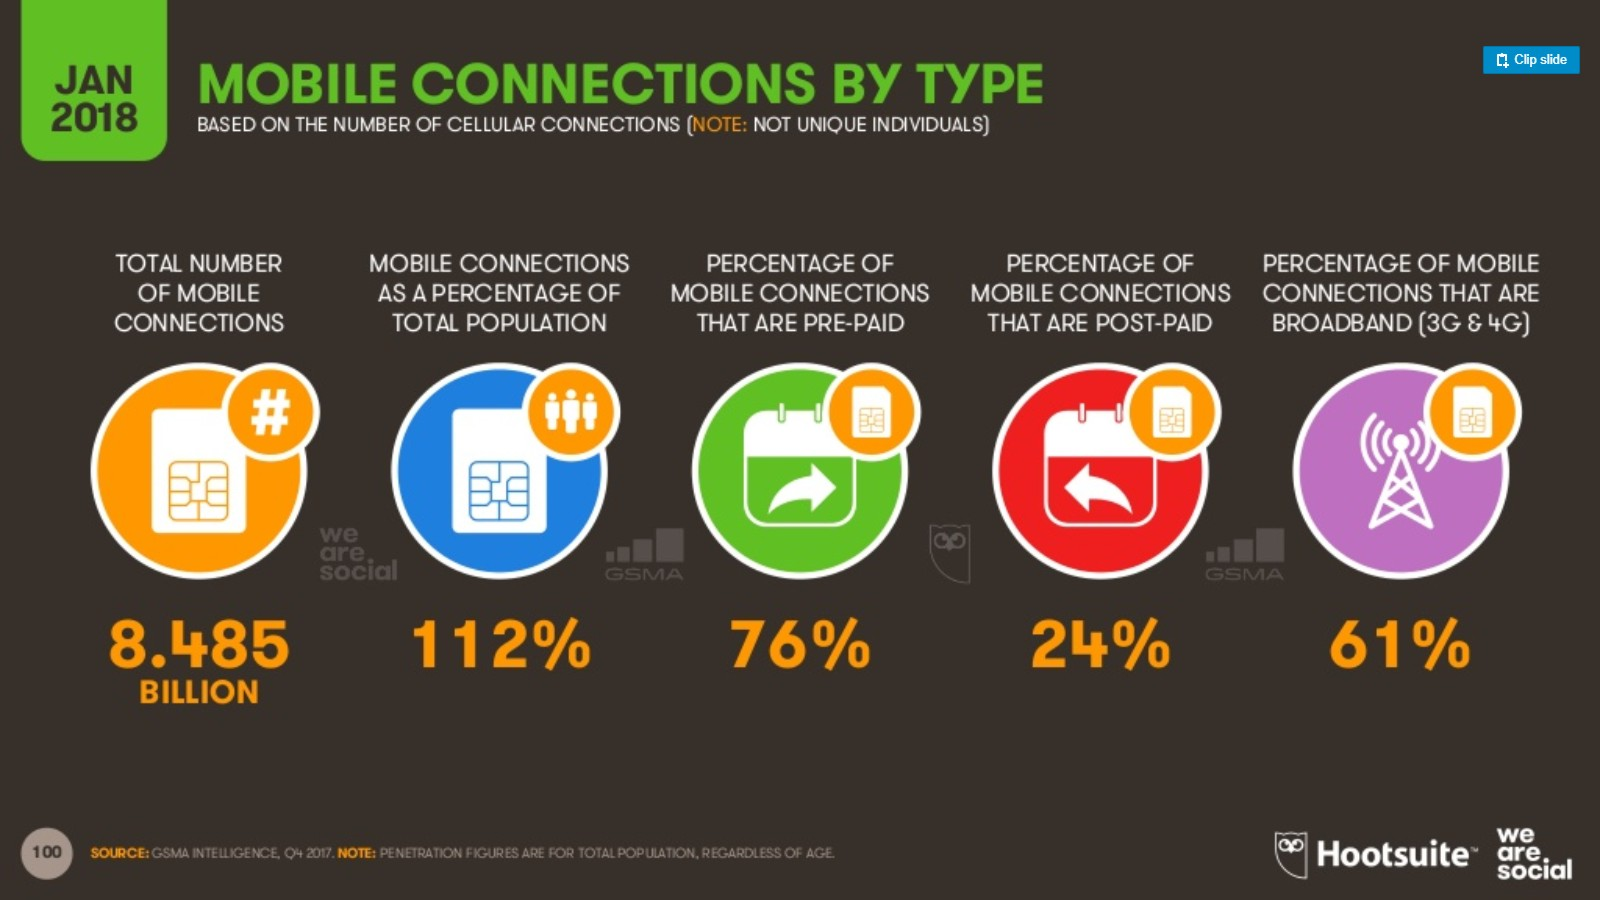 móviles conectados a Internet 2 tipo de conexion